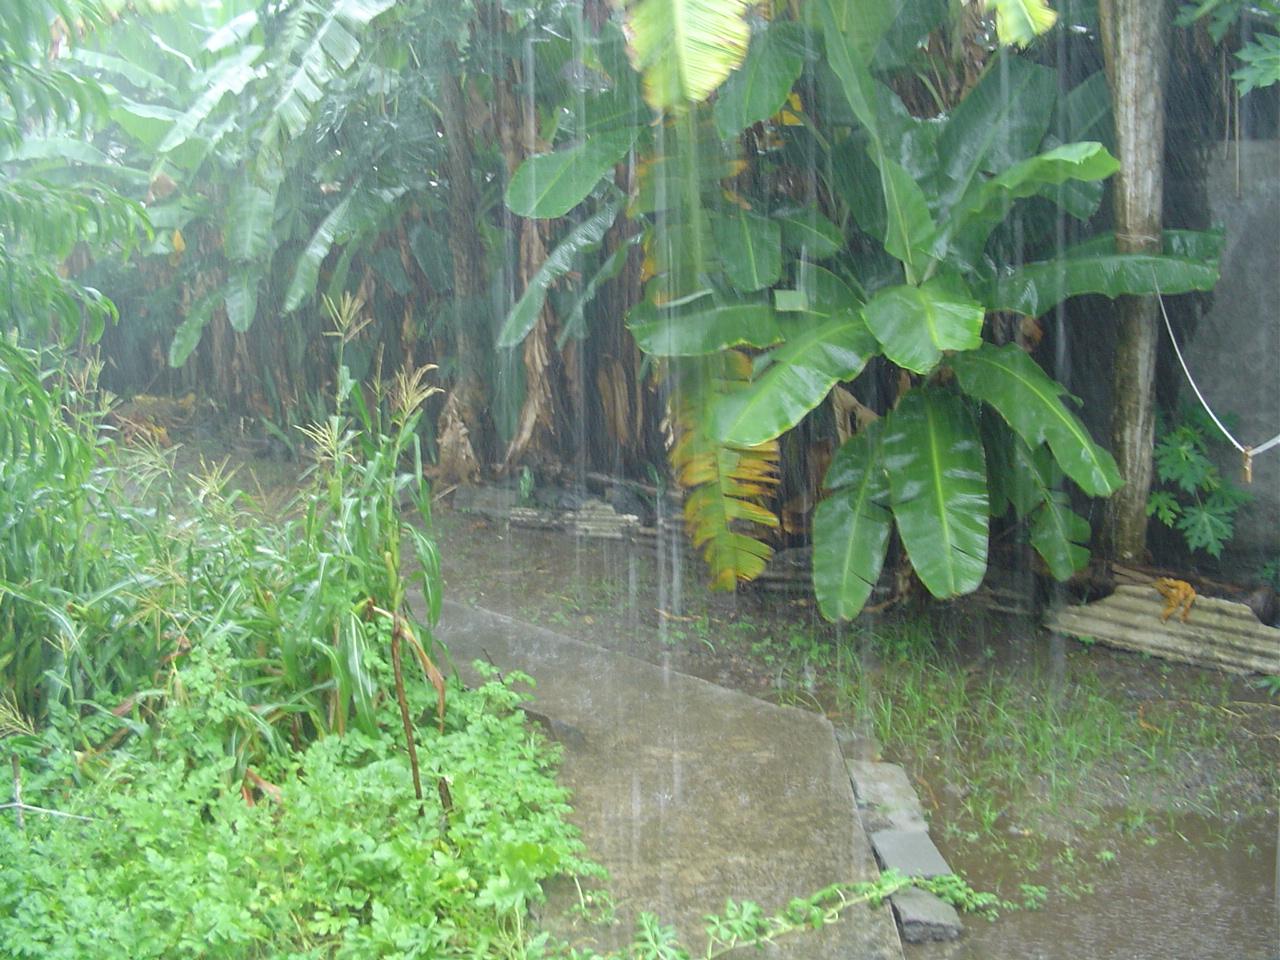 UHORAHO YARAYE AREKUYE IMVURA Y'IGIHUNGURABAYI HENSHI MU GIHUGU... Rain_season_in_Mayotte